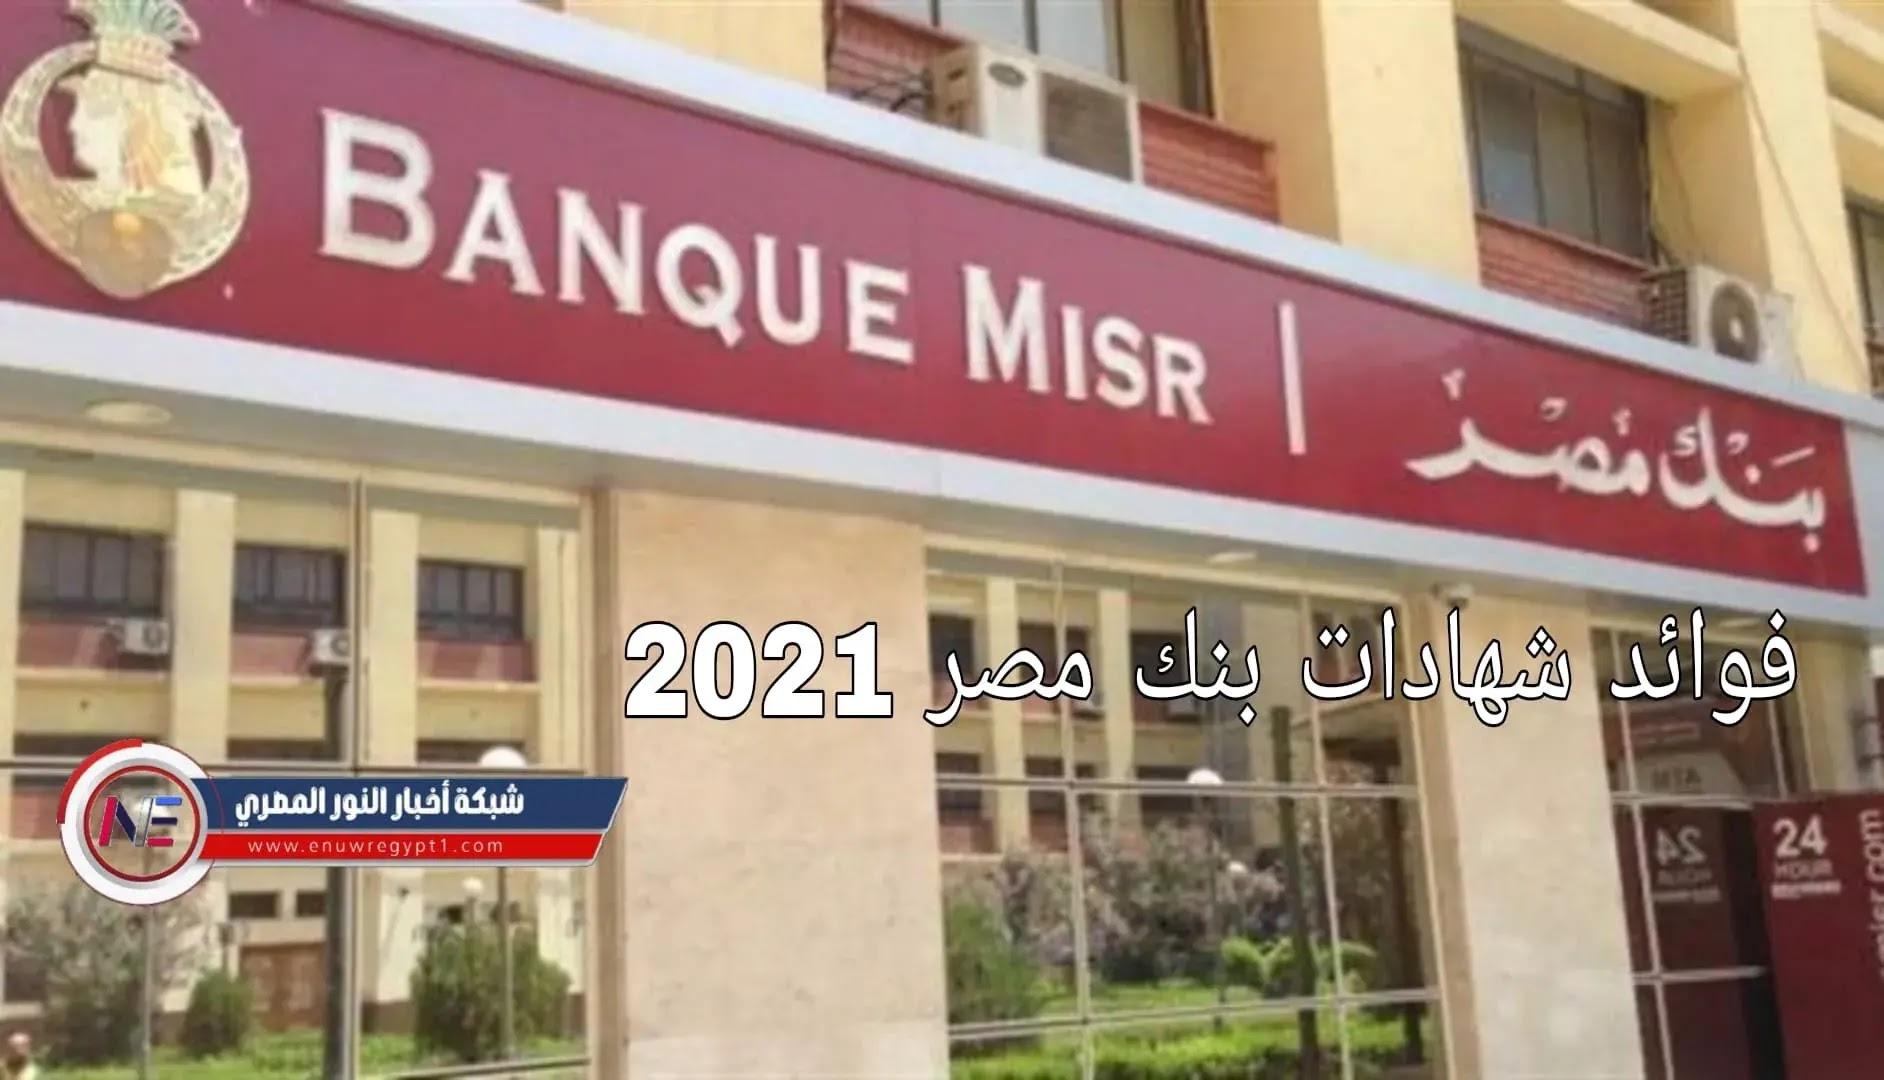 شهادات بنك مصر 2021   بالتفاصيل اعرف مميزات واهم شهادات بنك مصر للادخار والاستثمار لجميع الفئات